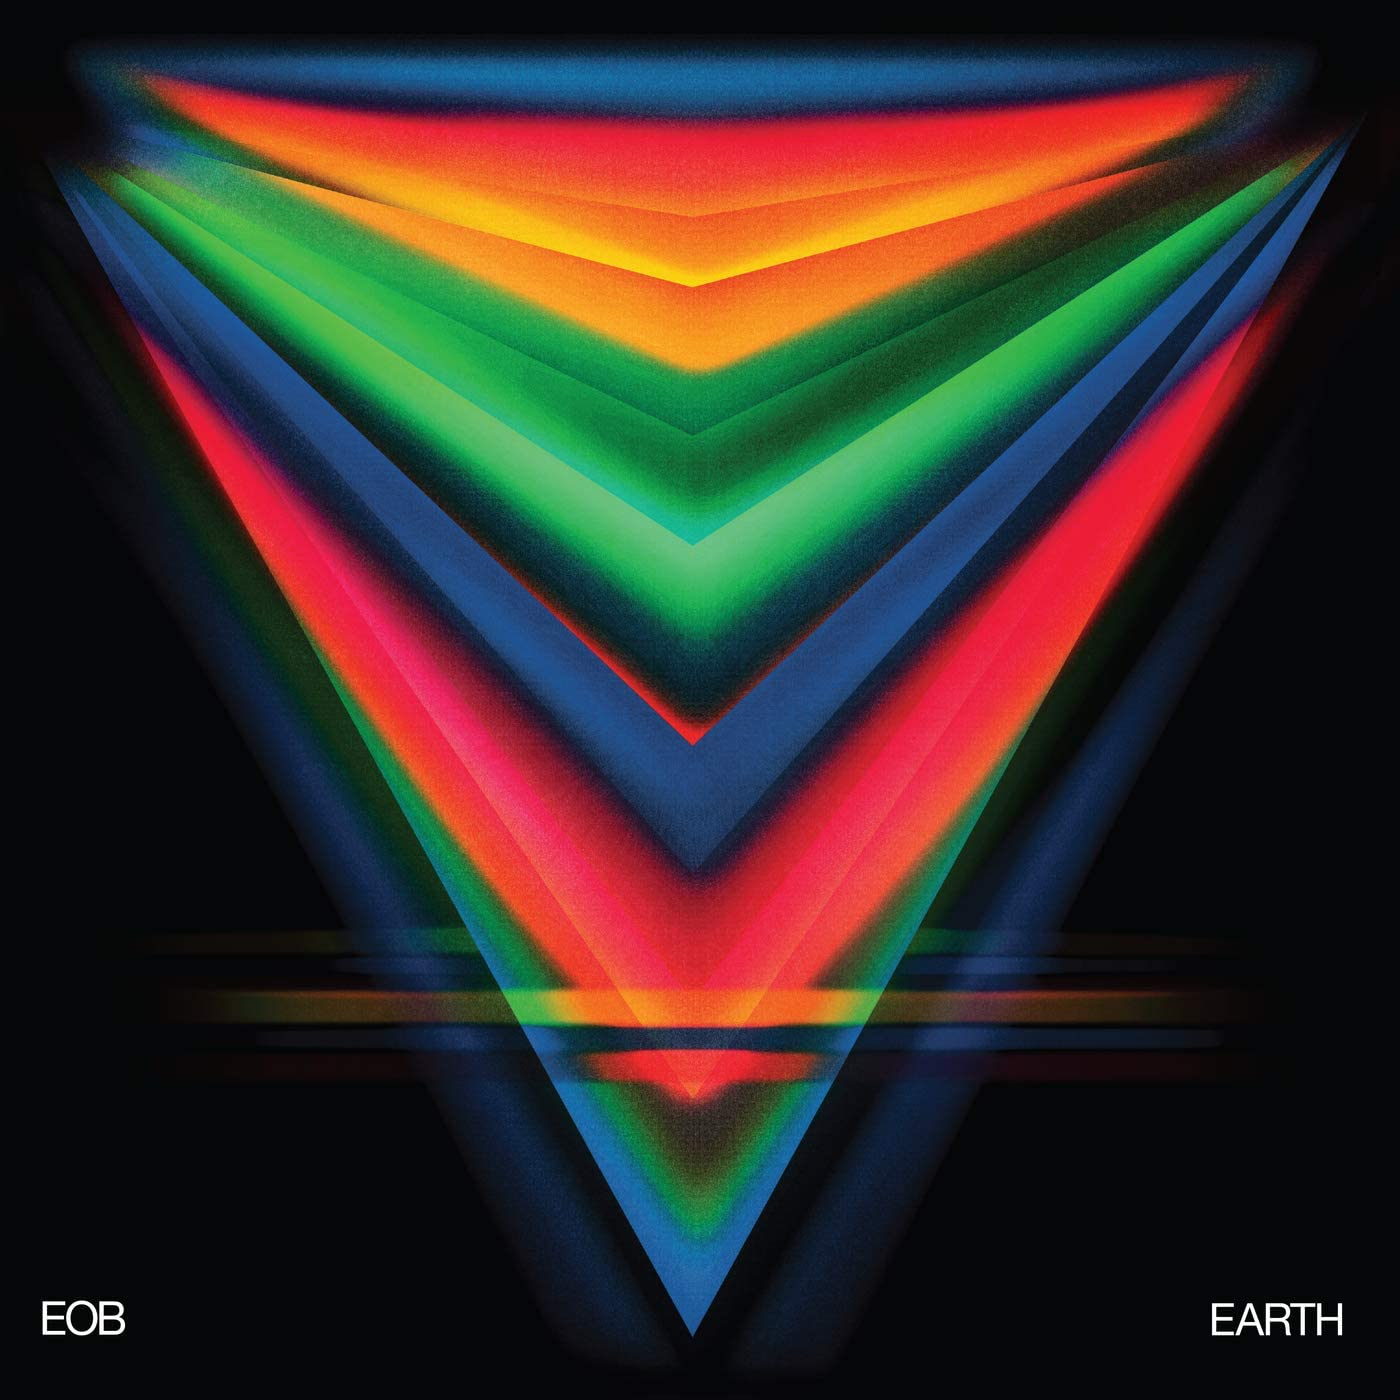 Copertina Vinile 33 giri Earth di Eob (Ed O'Brien)